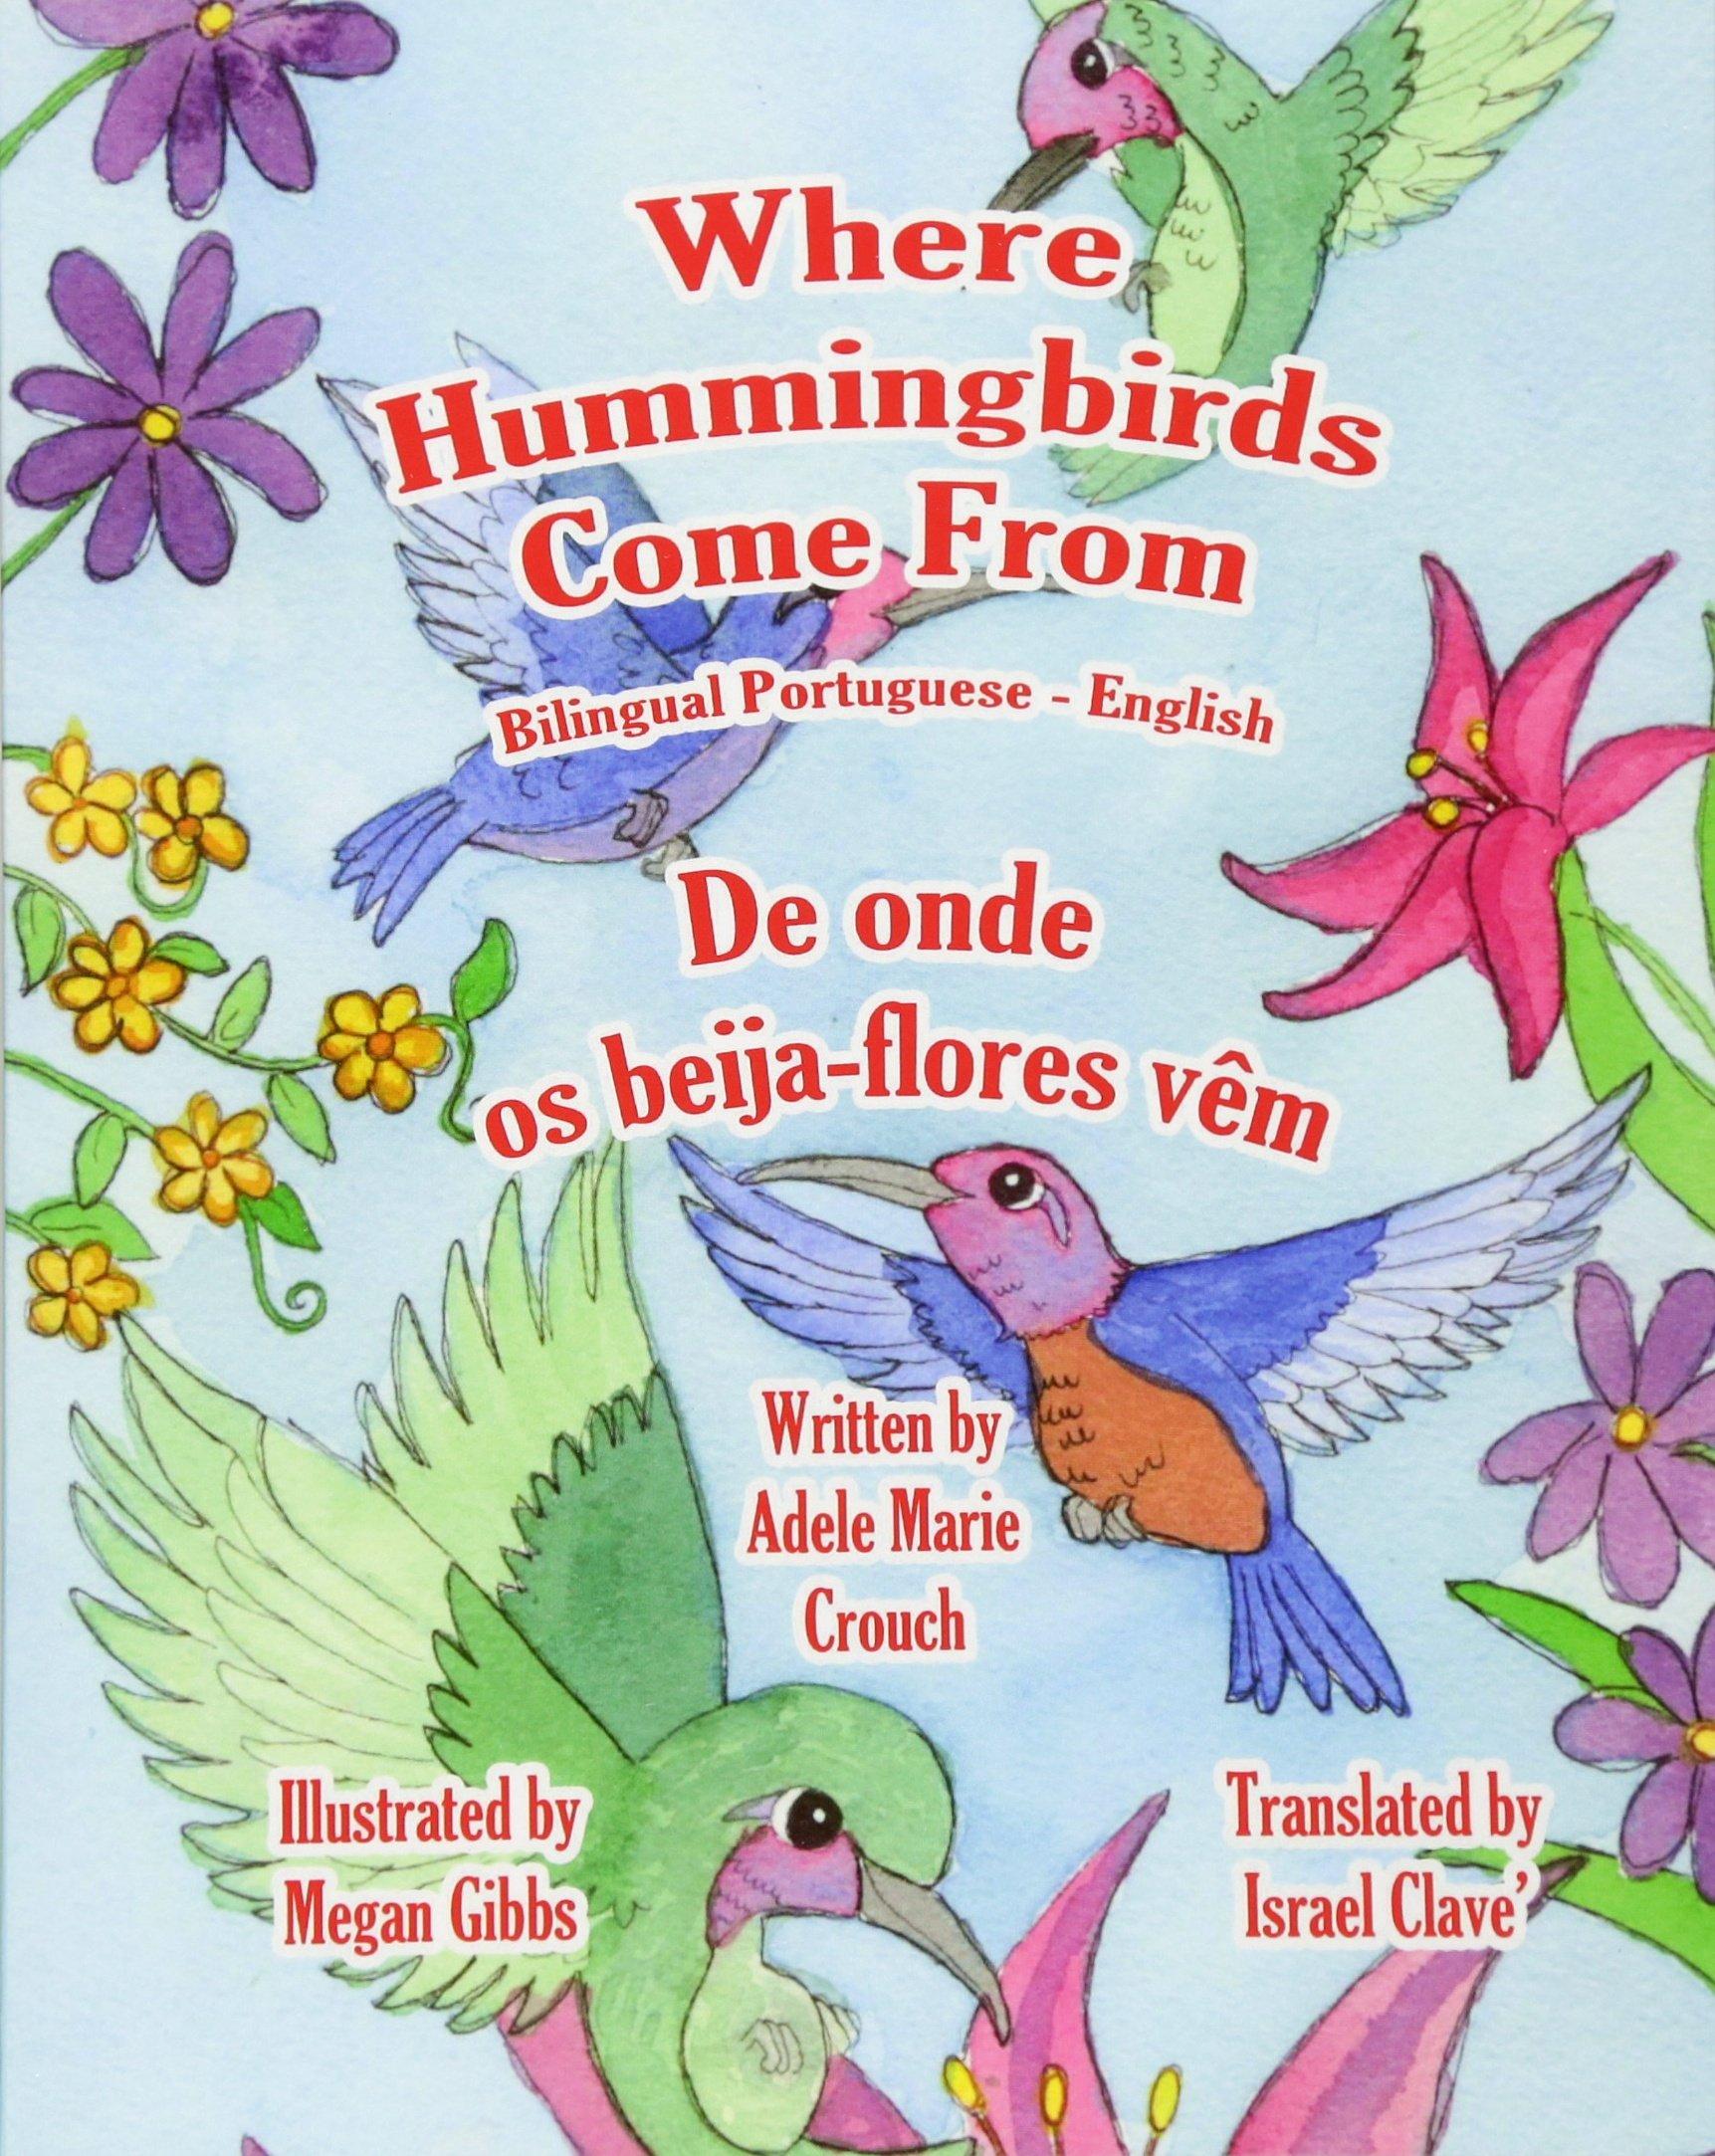 Download Where Hummingbirds Come From Bilingual Portuguese English (Portuguese and English Edition) ebook